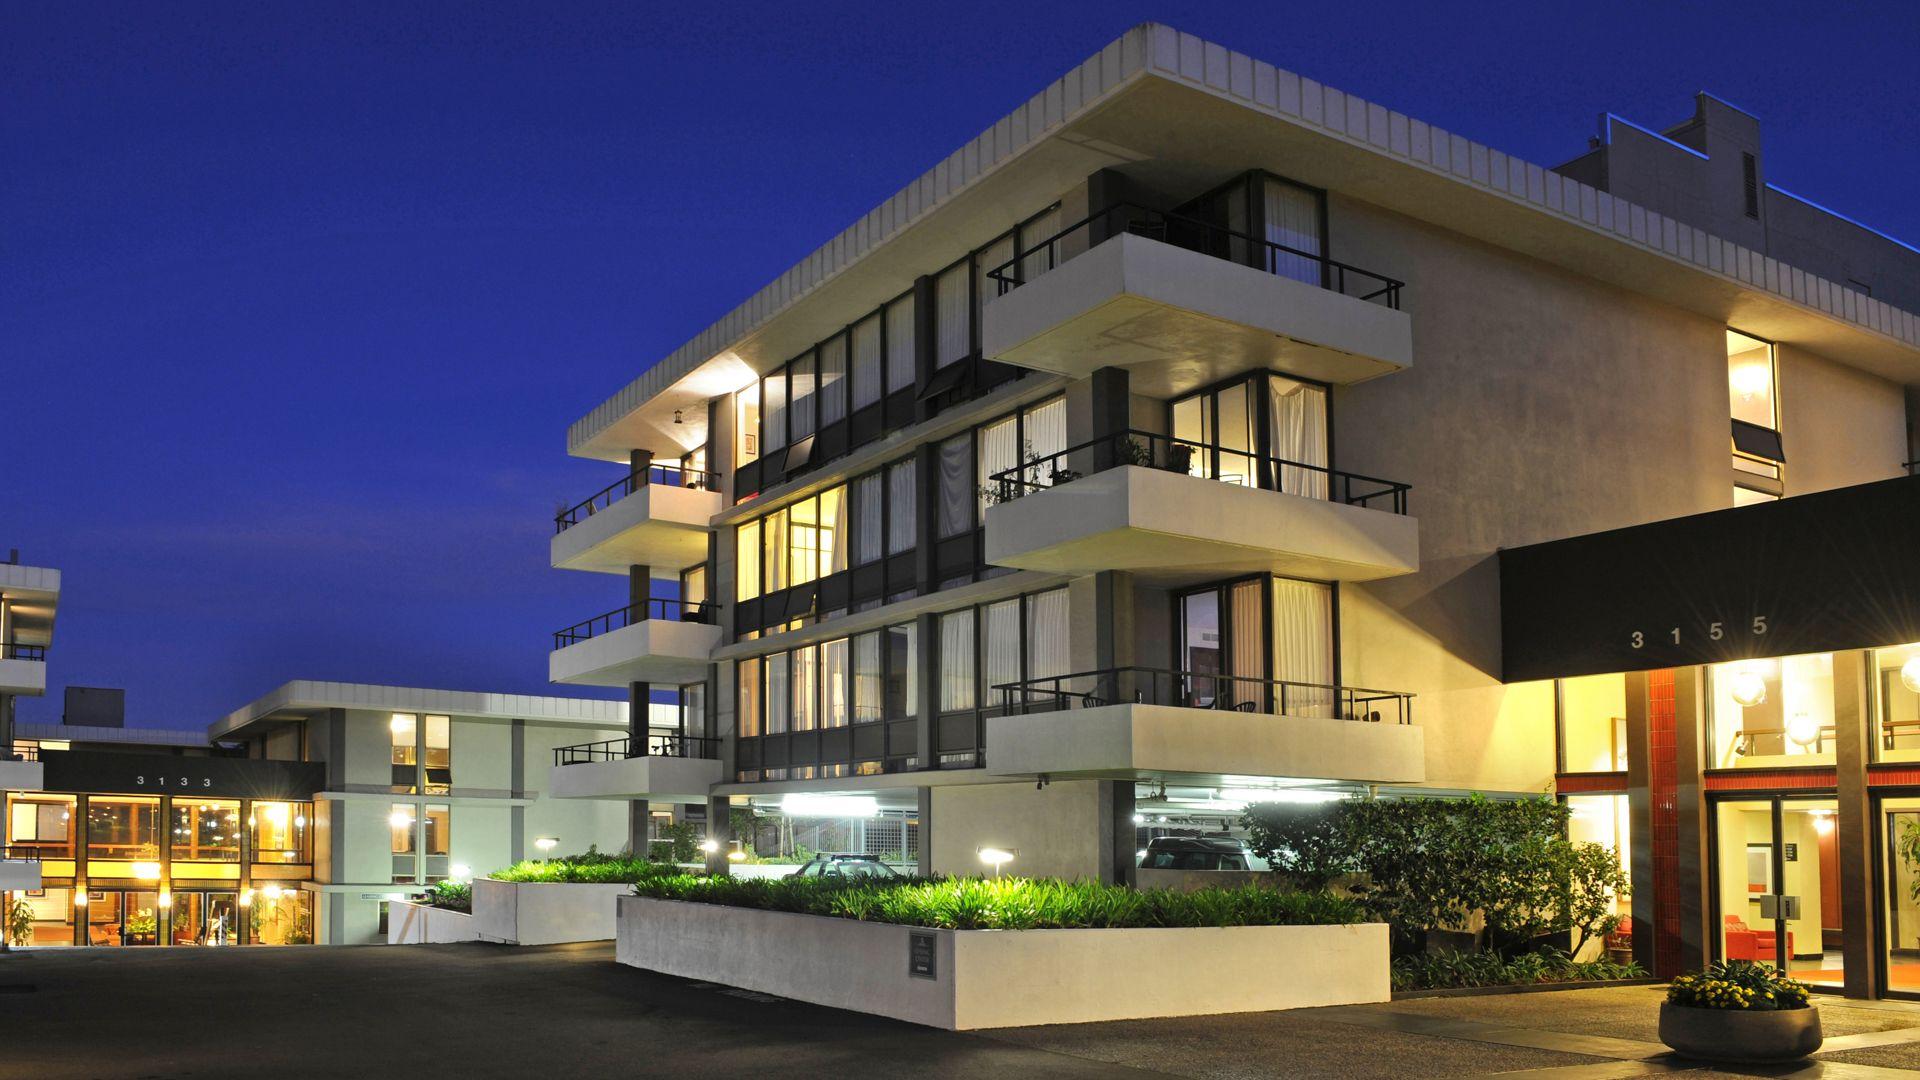 Skyline Terrace Apartments - Building